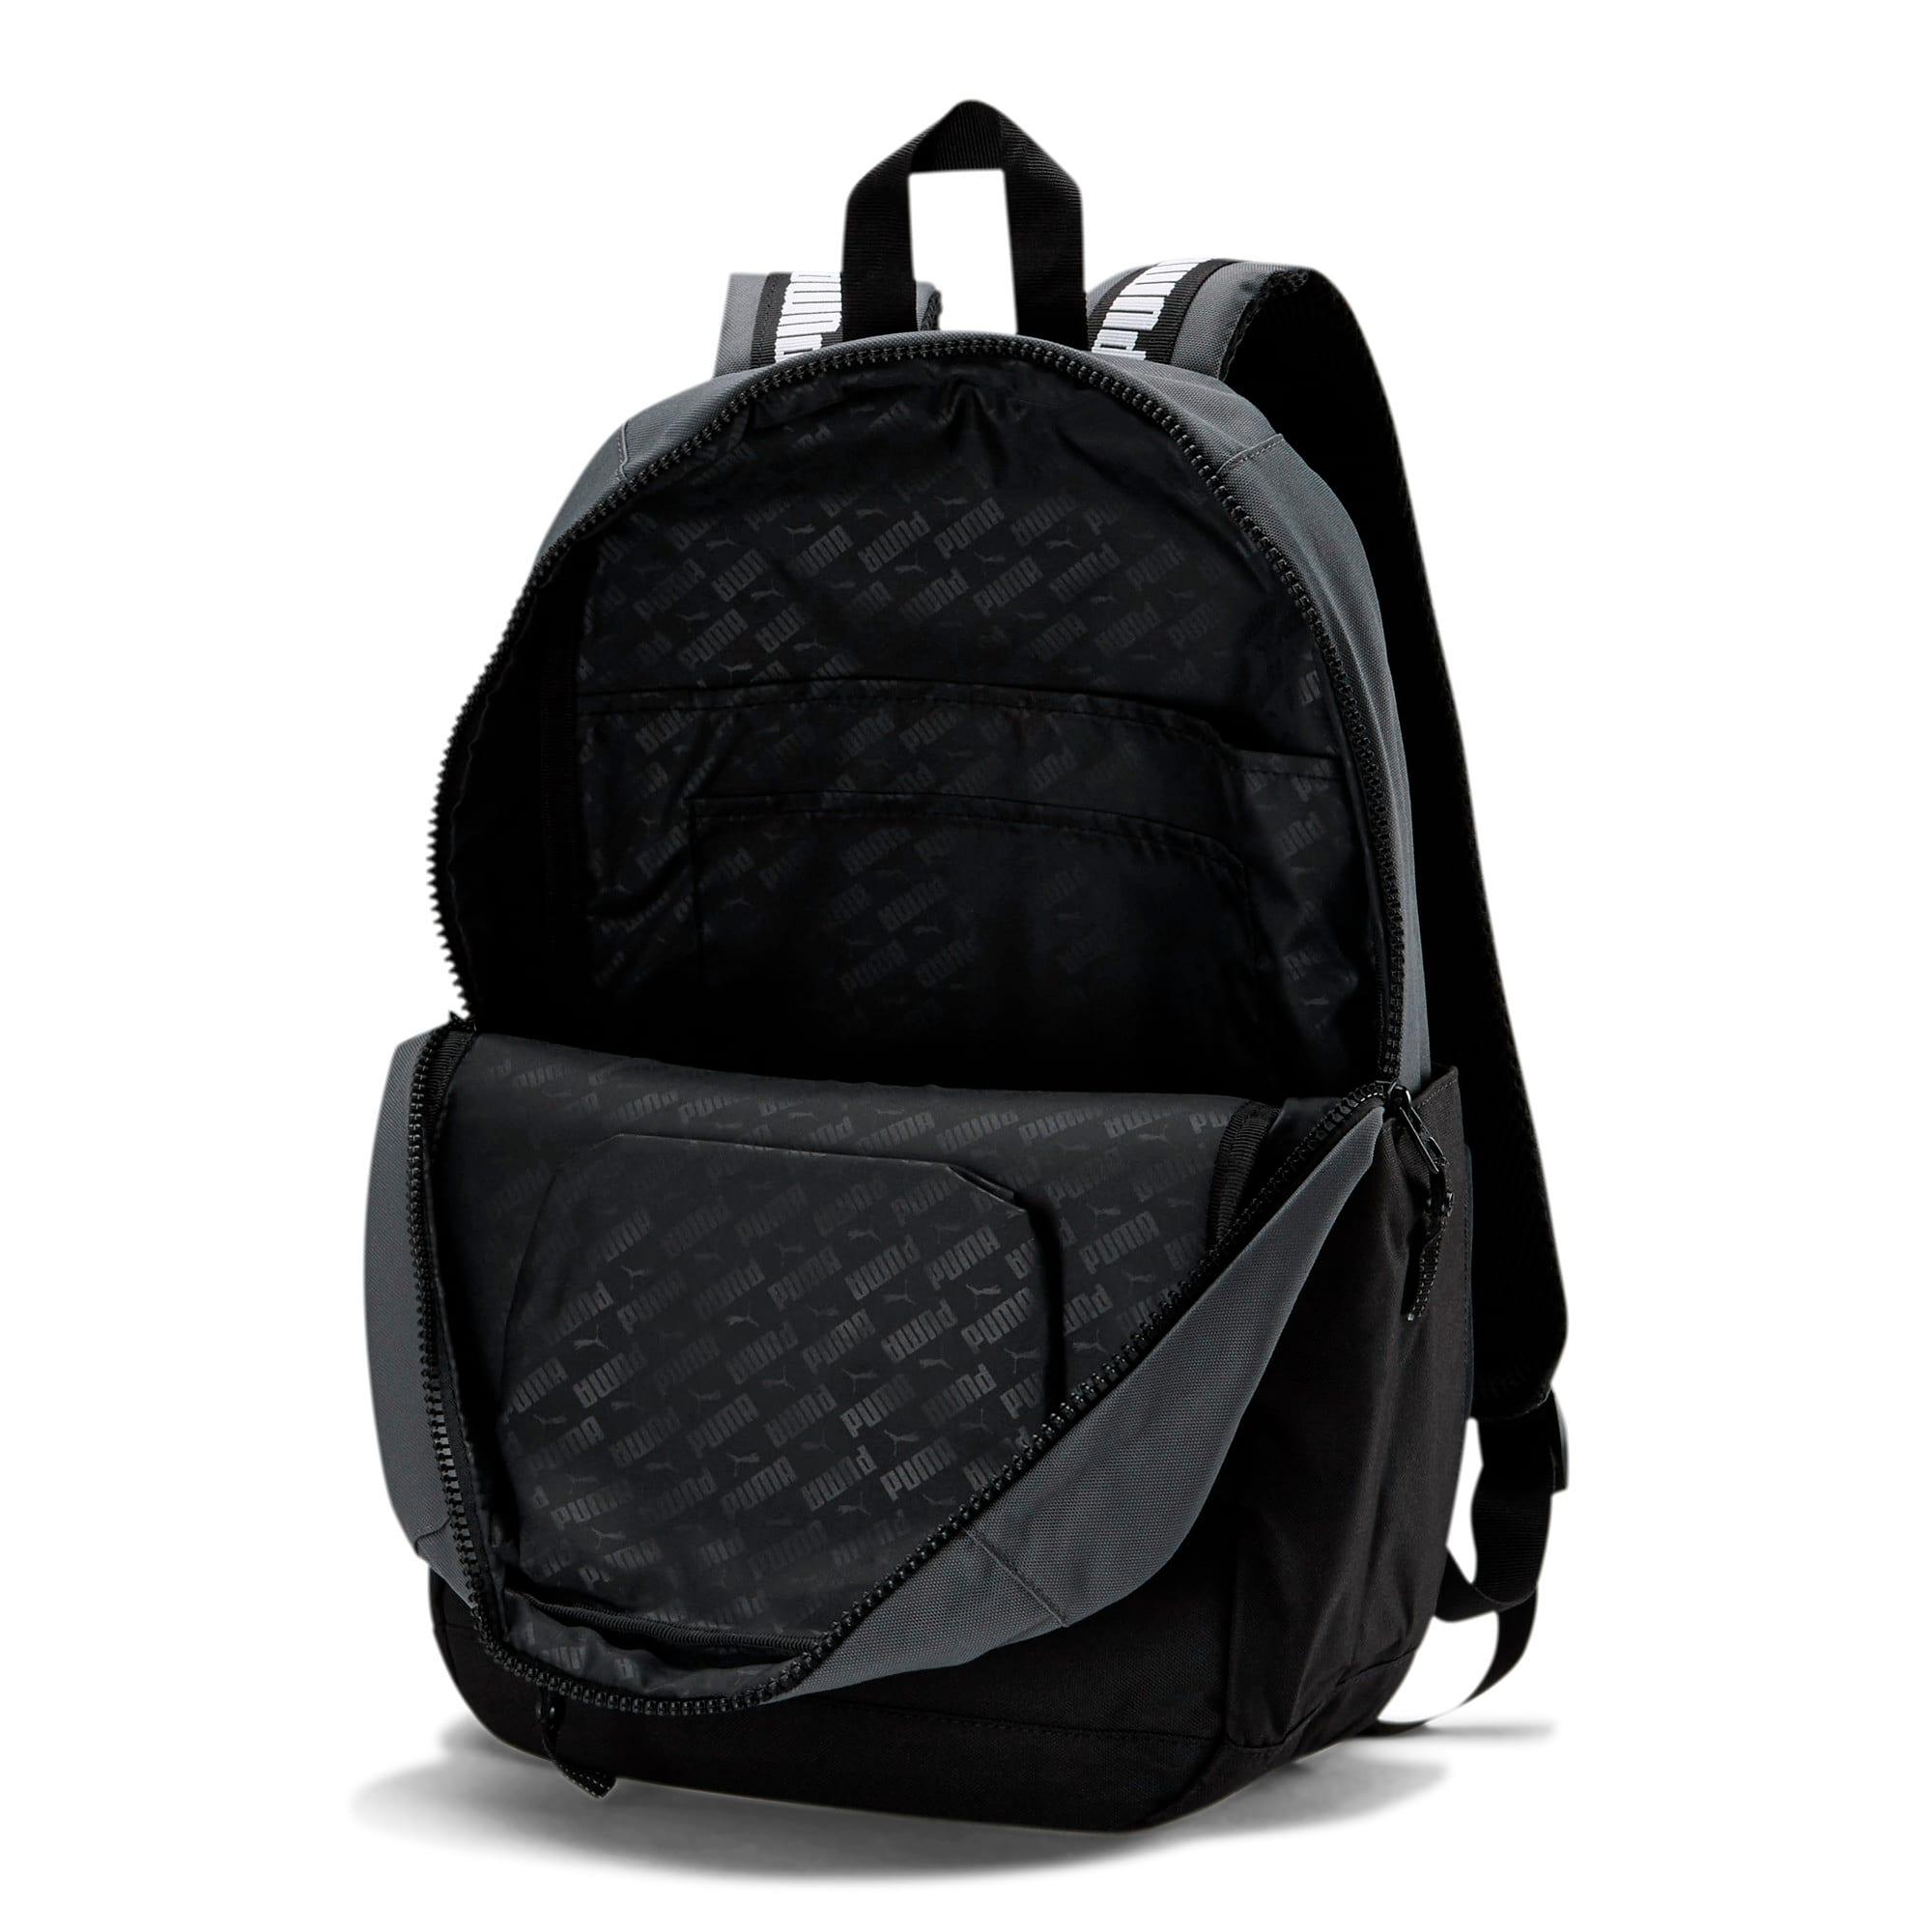 Thumbnail 3 of Streak Backpack, Dark Grey, medium